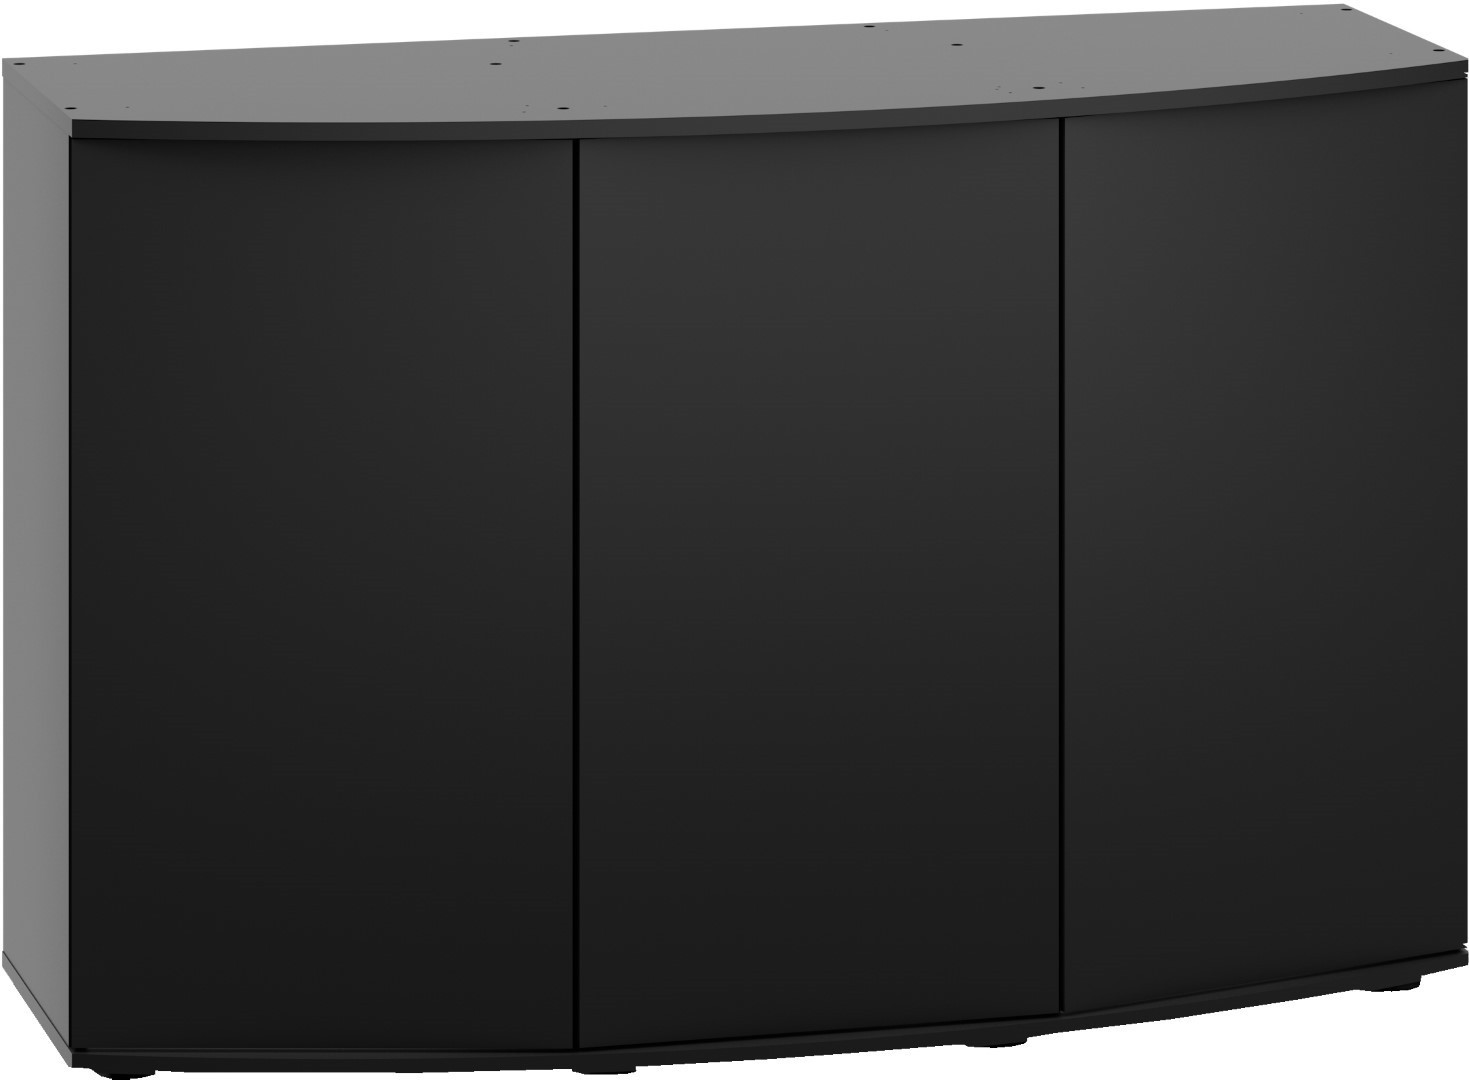 Juwel meubel bouwpakket SBX Vision 260 zwart